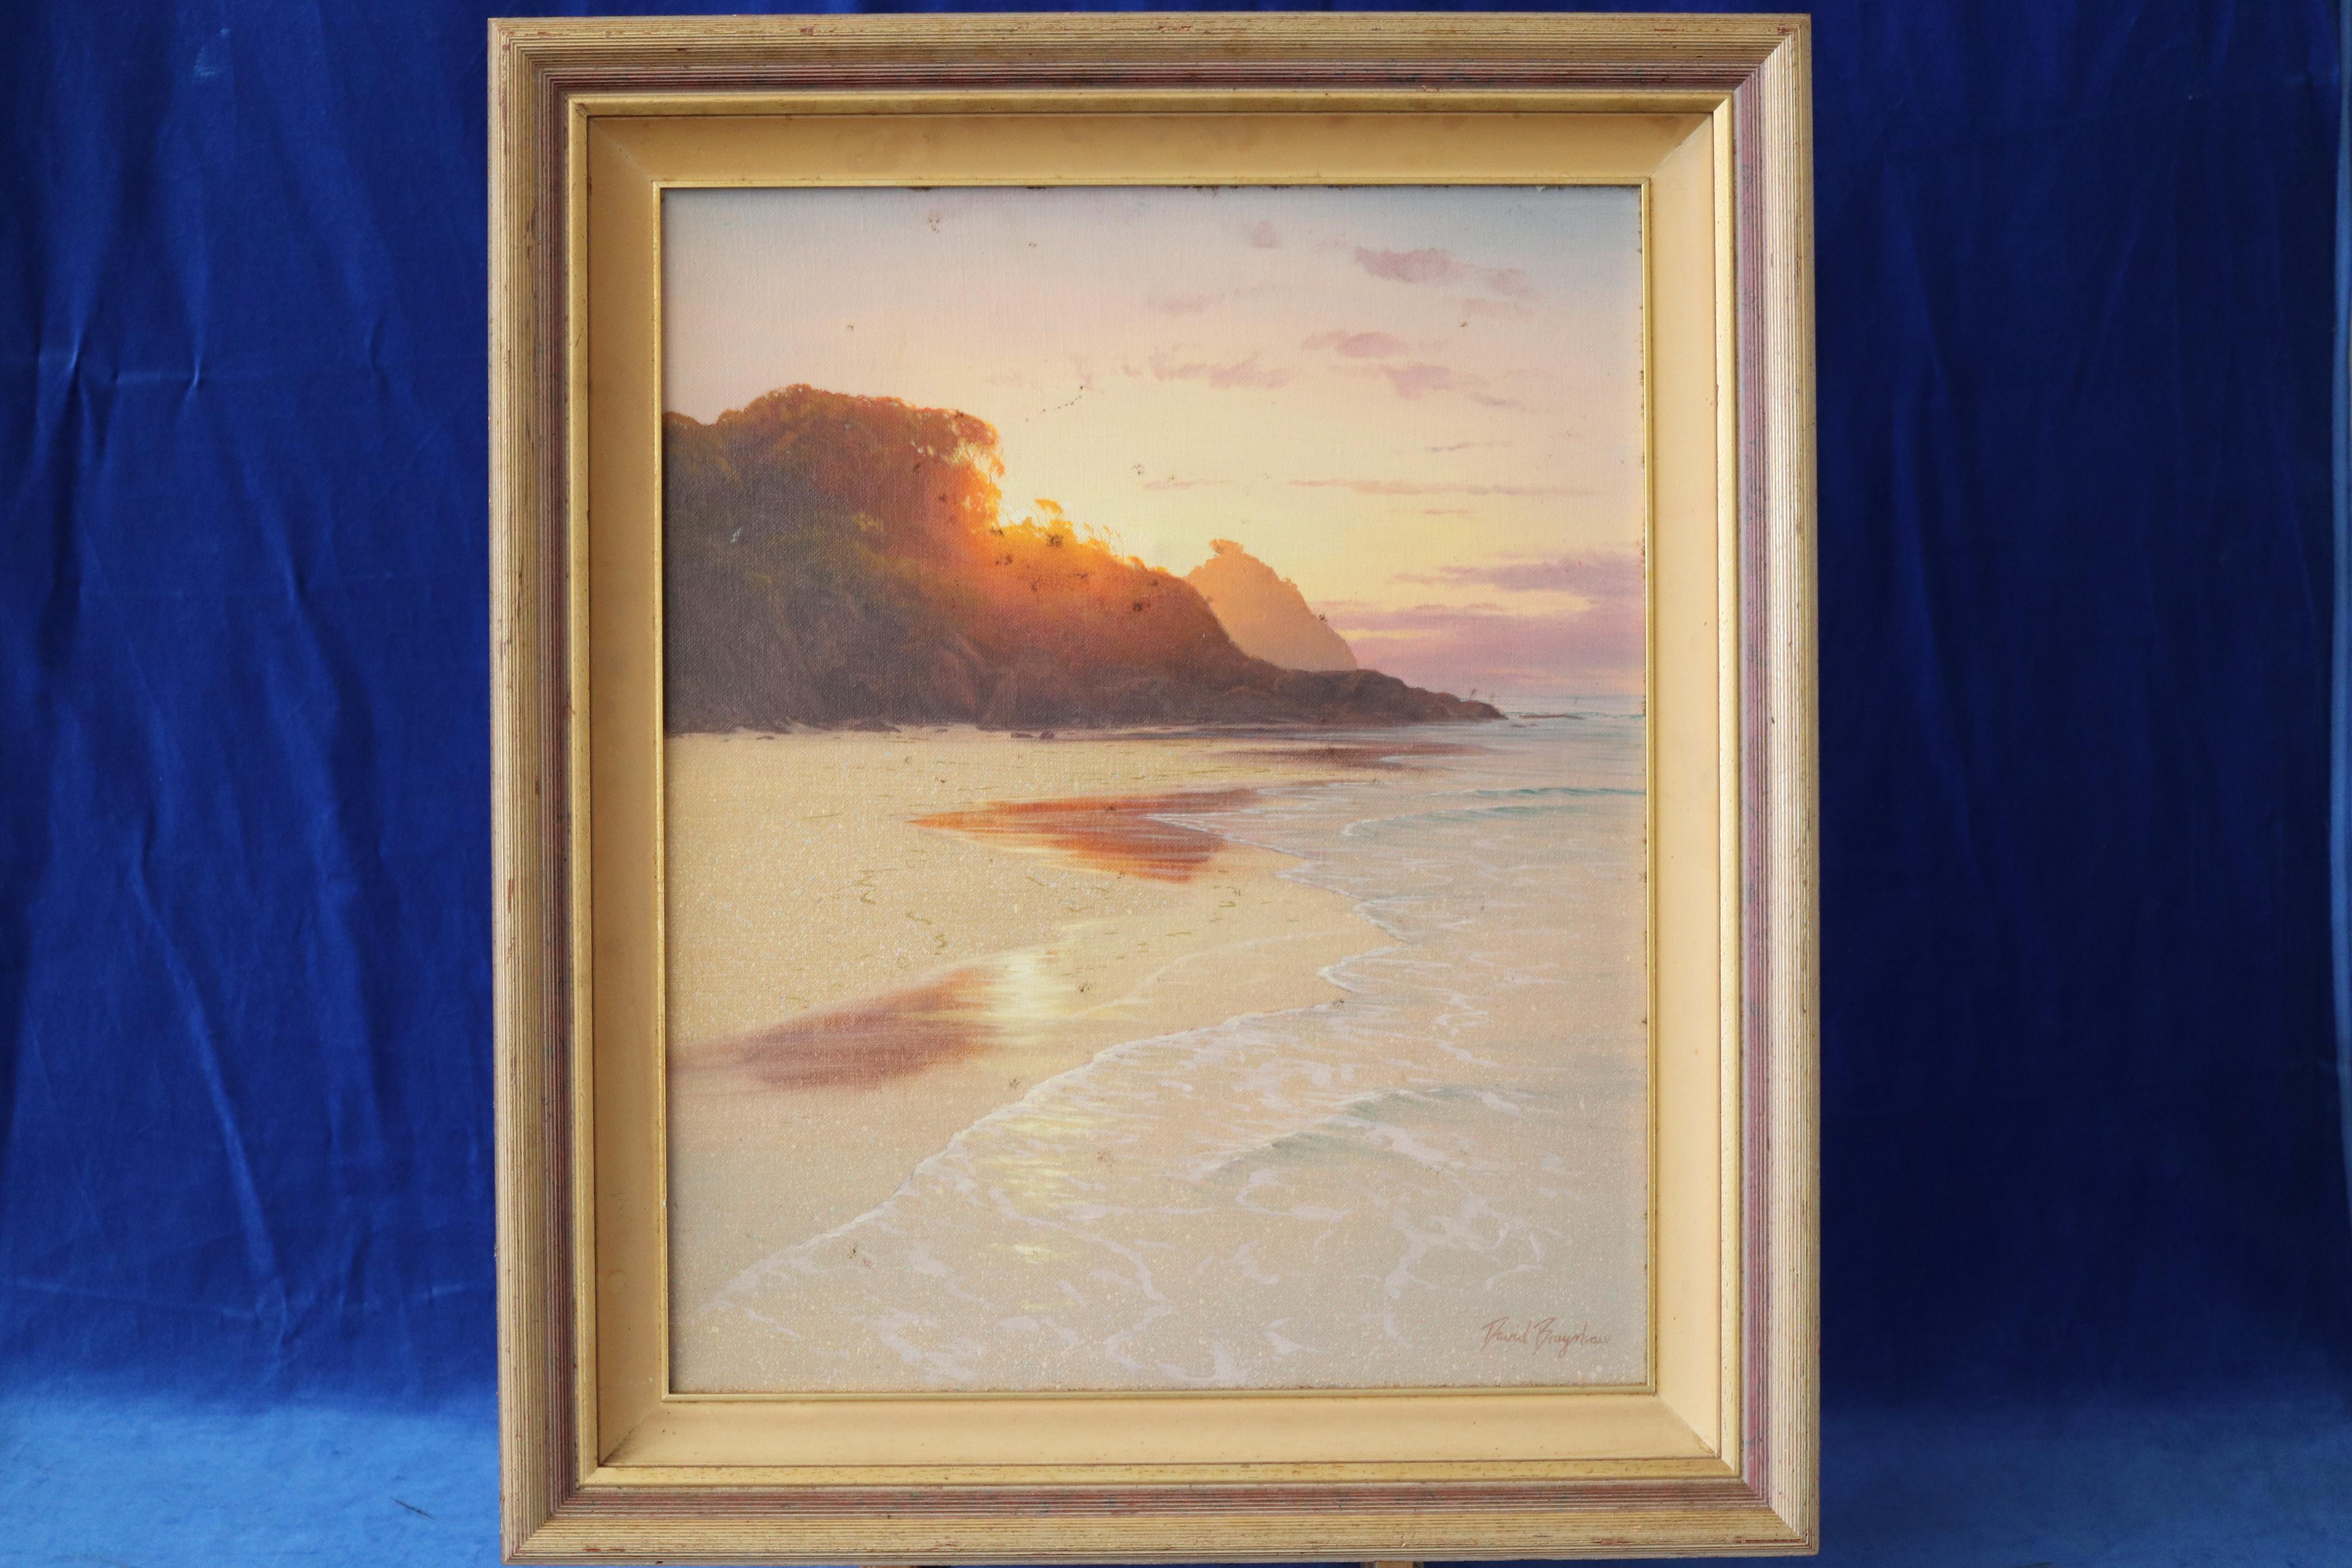 DAVID BRAYSHAW - LISTED AUSTRALIAN ARTIST - ORIGINAL LISTED ARTIST COASTAL SCENE (WIND FARMS - SHIPWRECK BEACH)